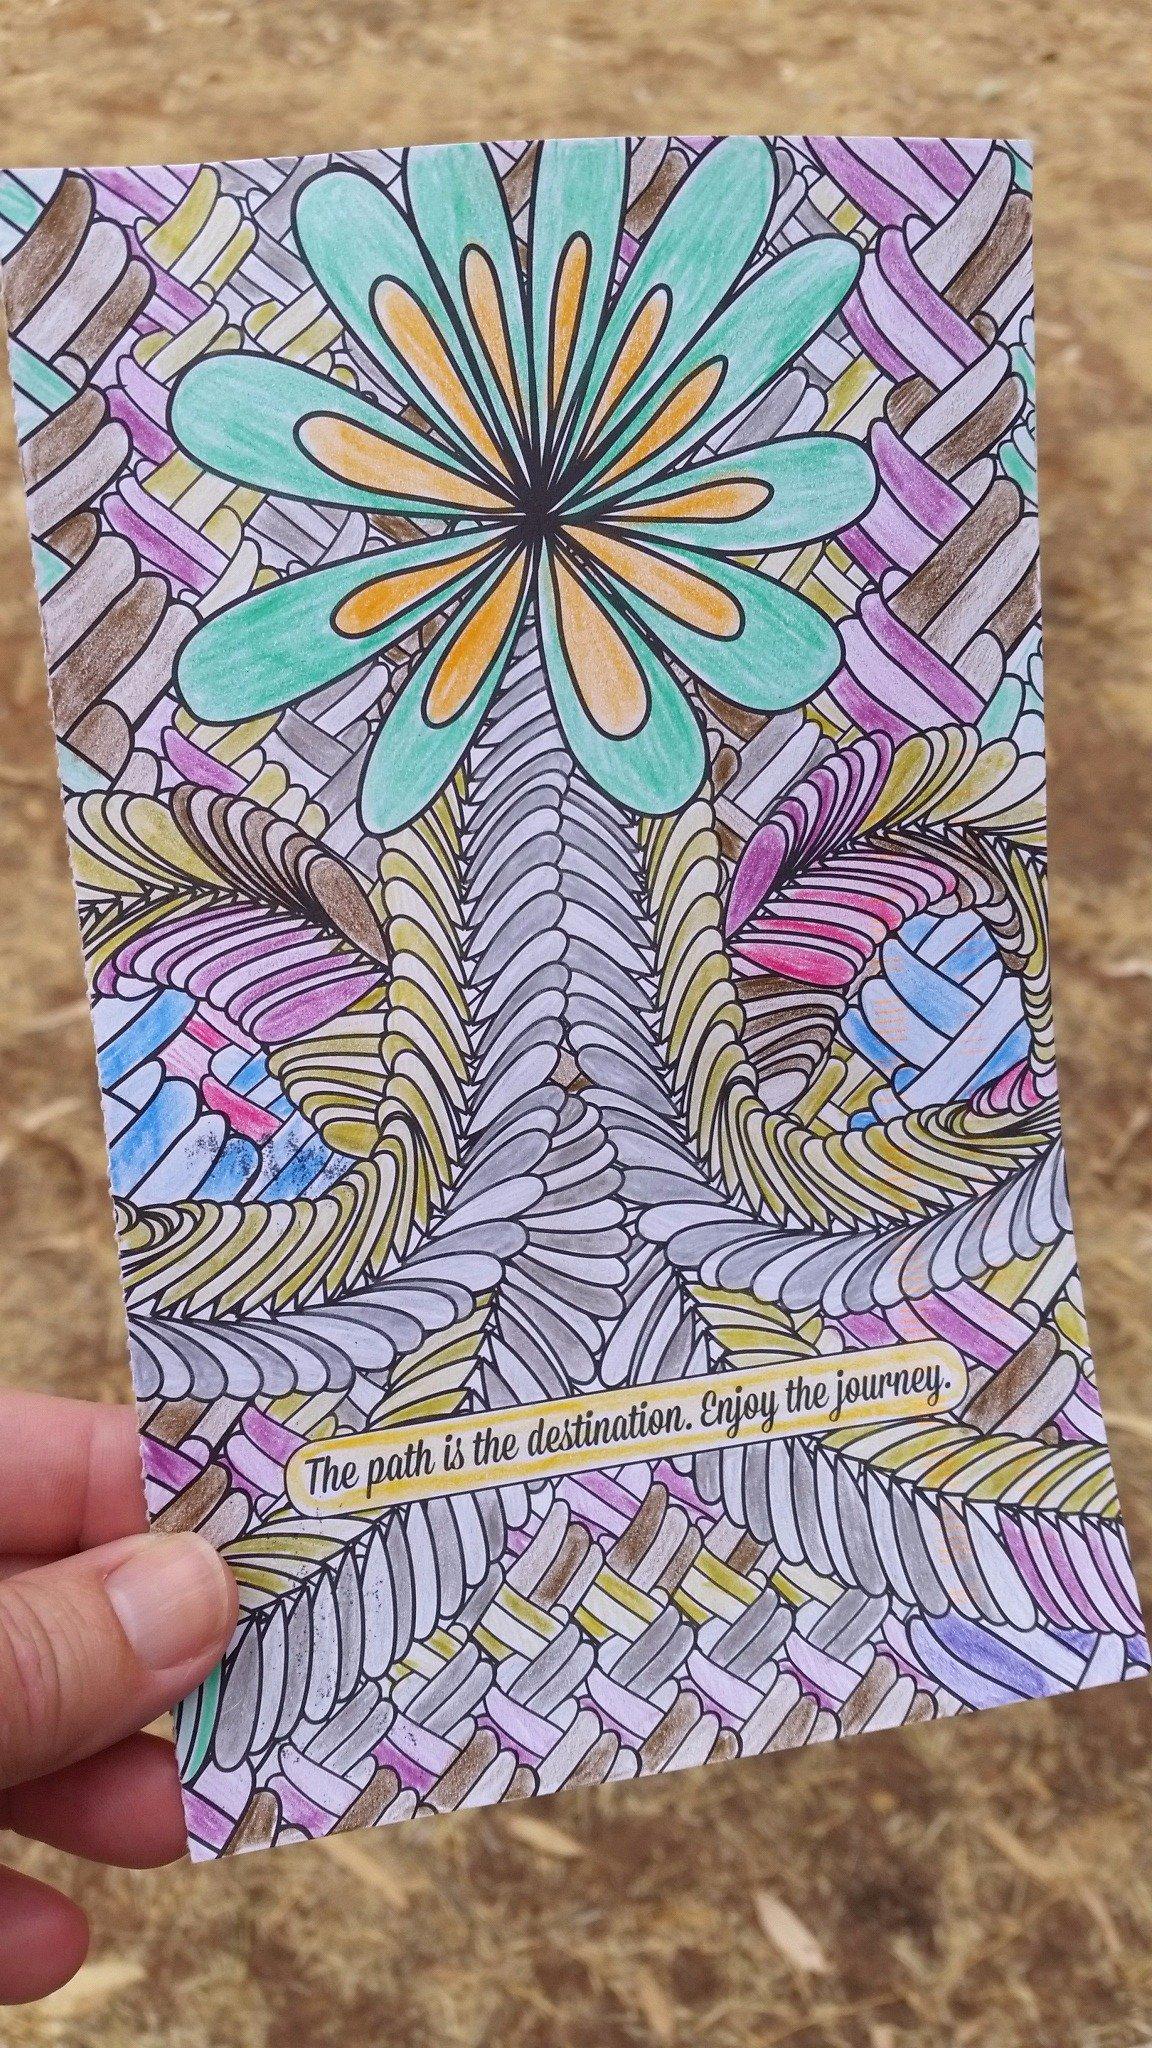 Weaving Knots. https://t.co/GVlZ1WzaFw Thanks @dogtrax #CLMOOC #Postcards @kfasimpaur https://t.co/iJL1X3fUtw